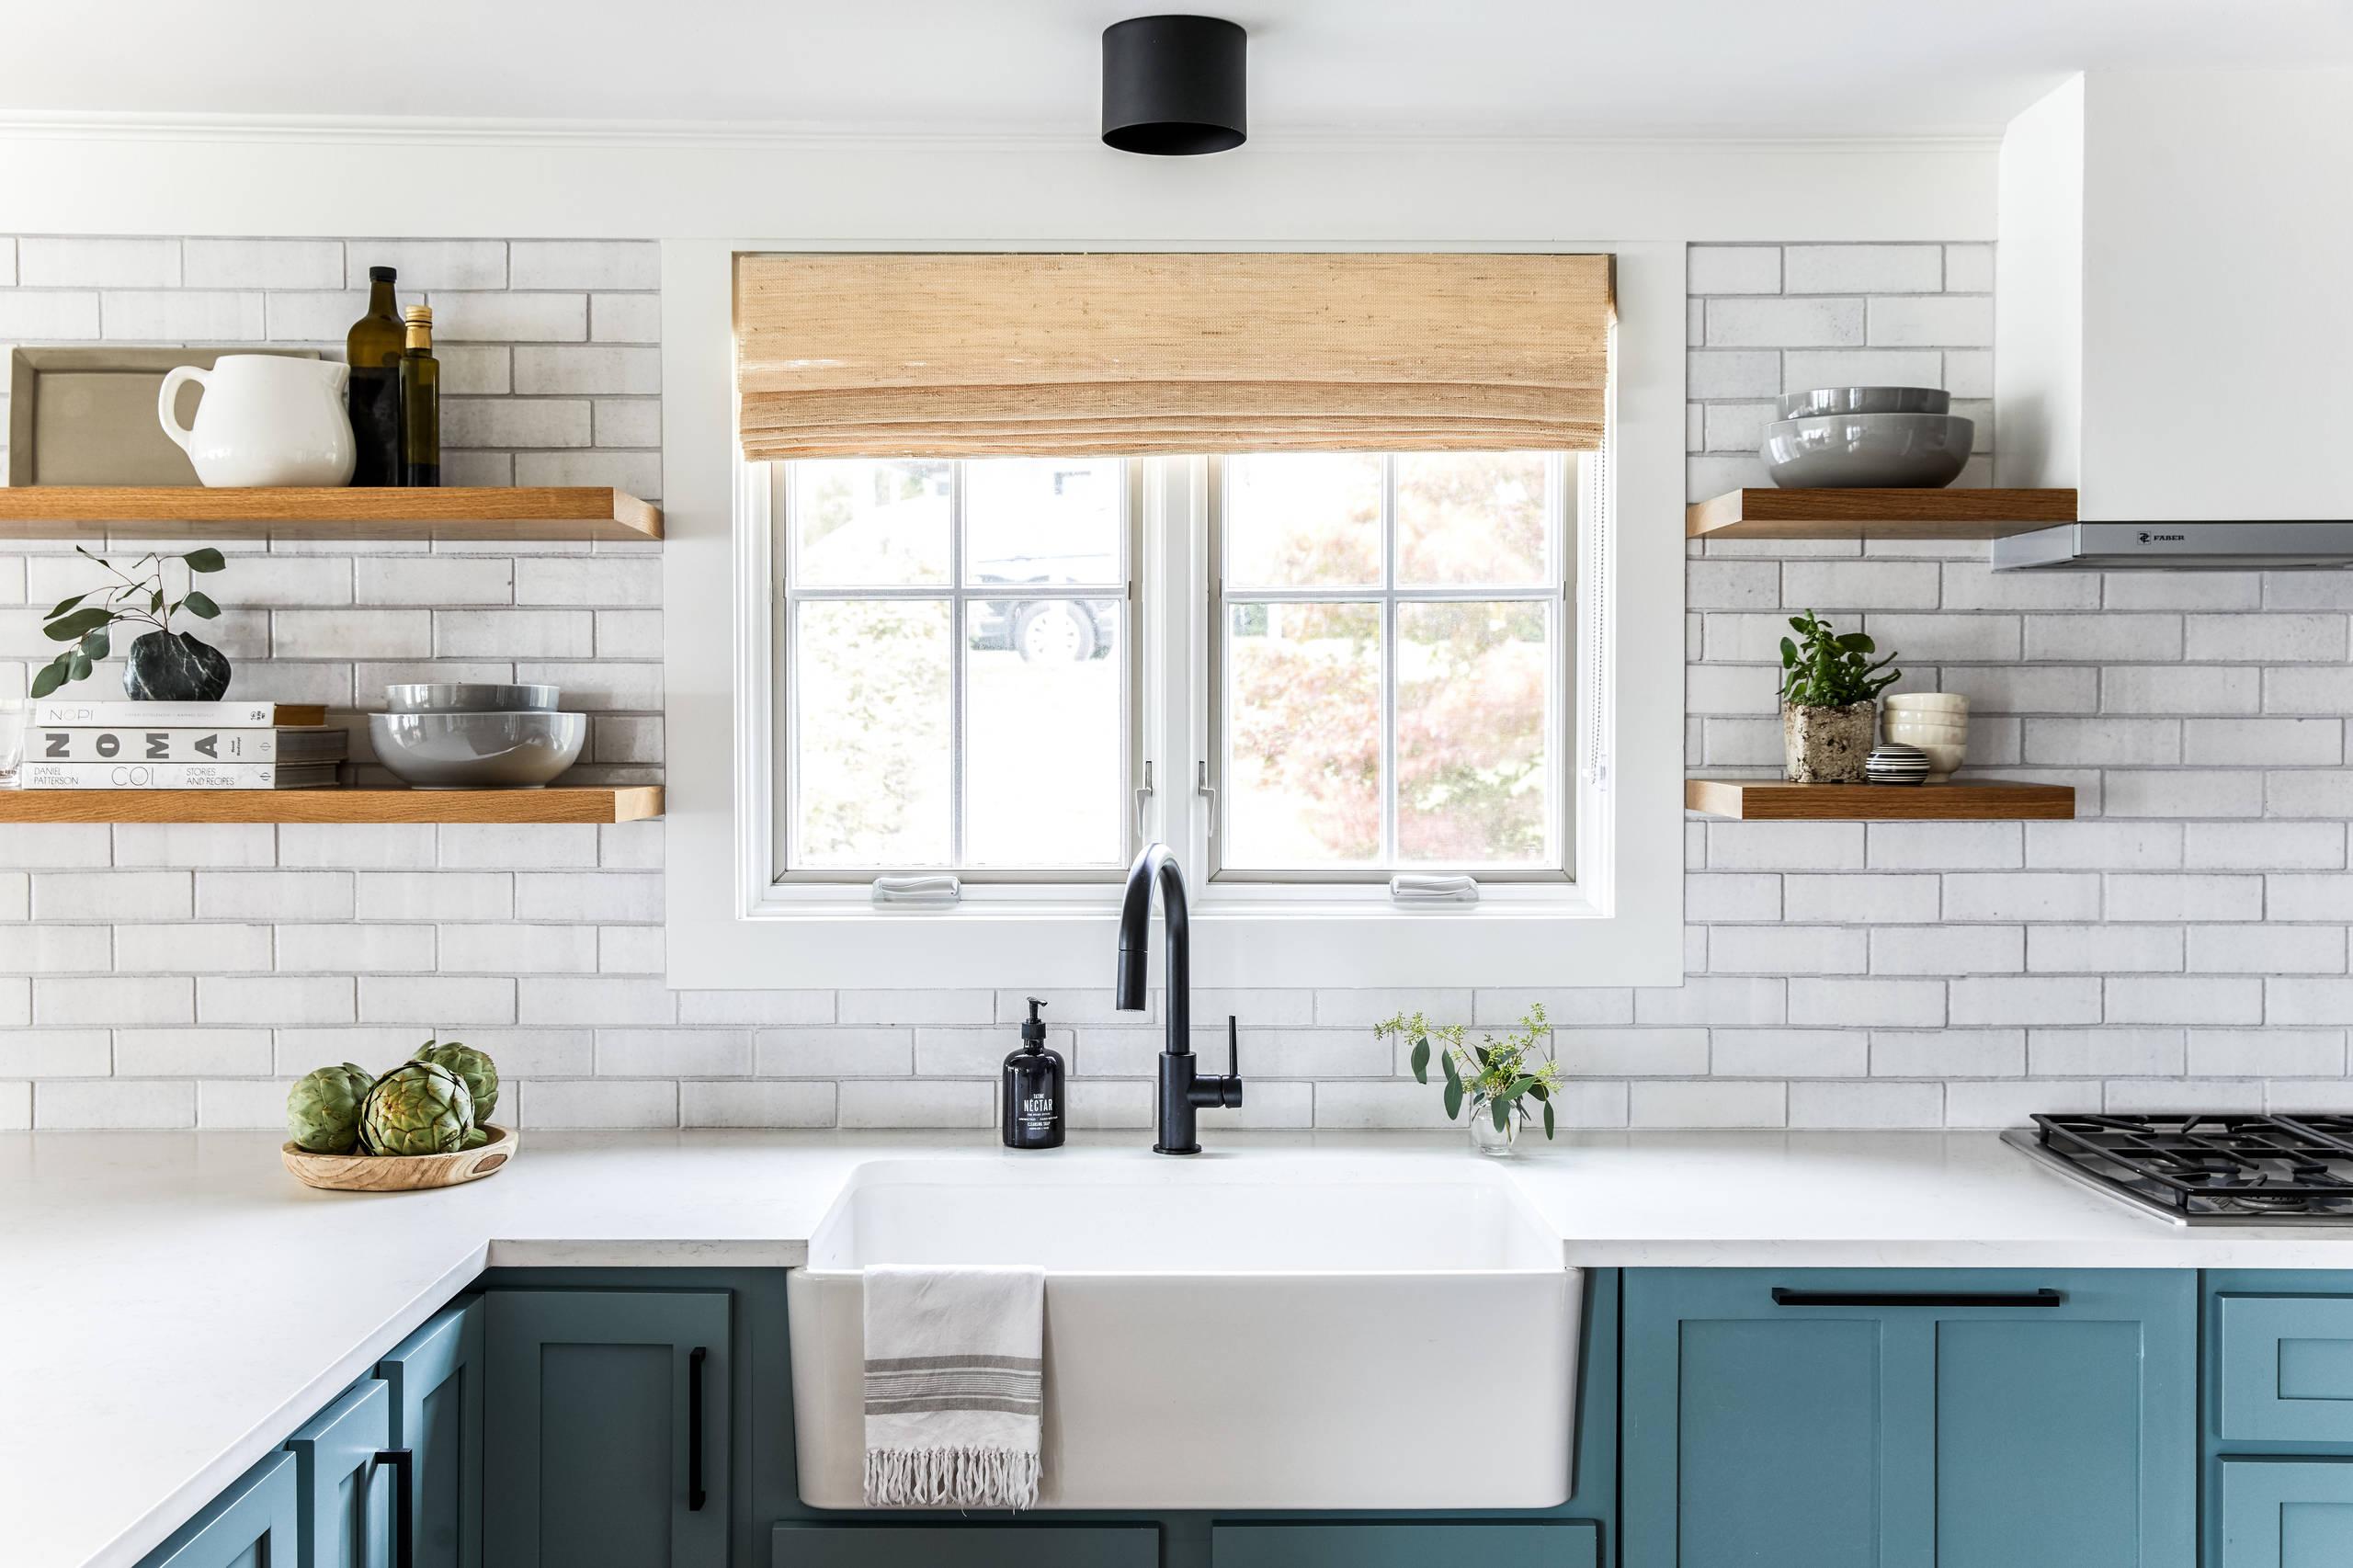 75 Beautiful White Kitchen With Brick Backsplash Pictures Ideas May 2021 Houzz